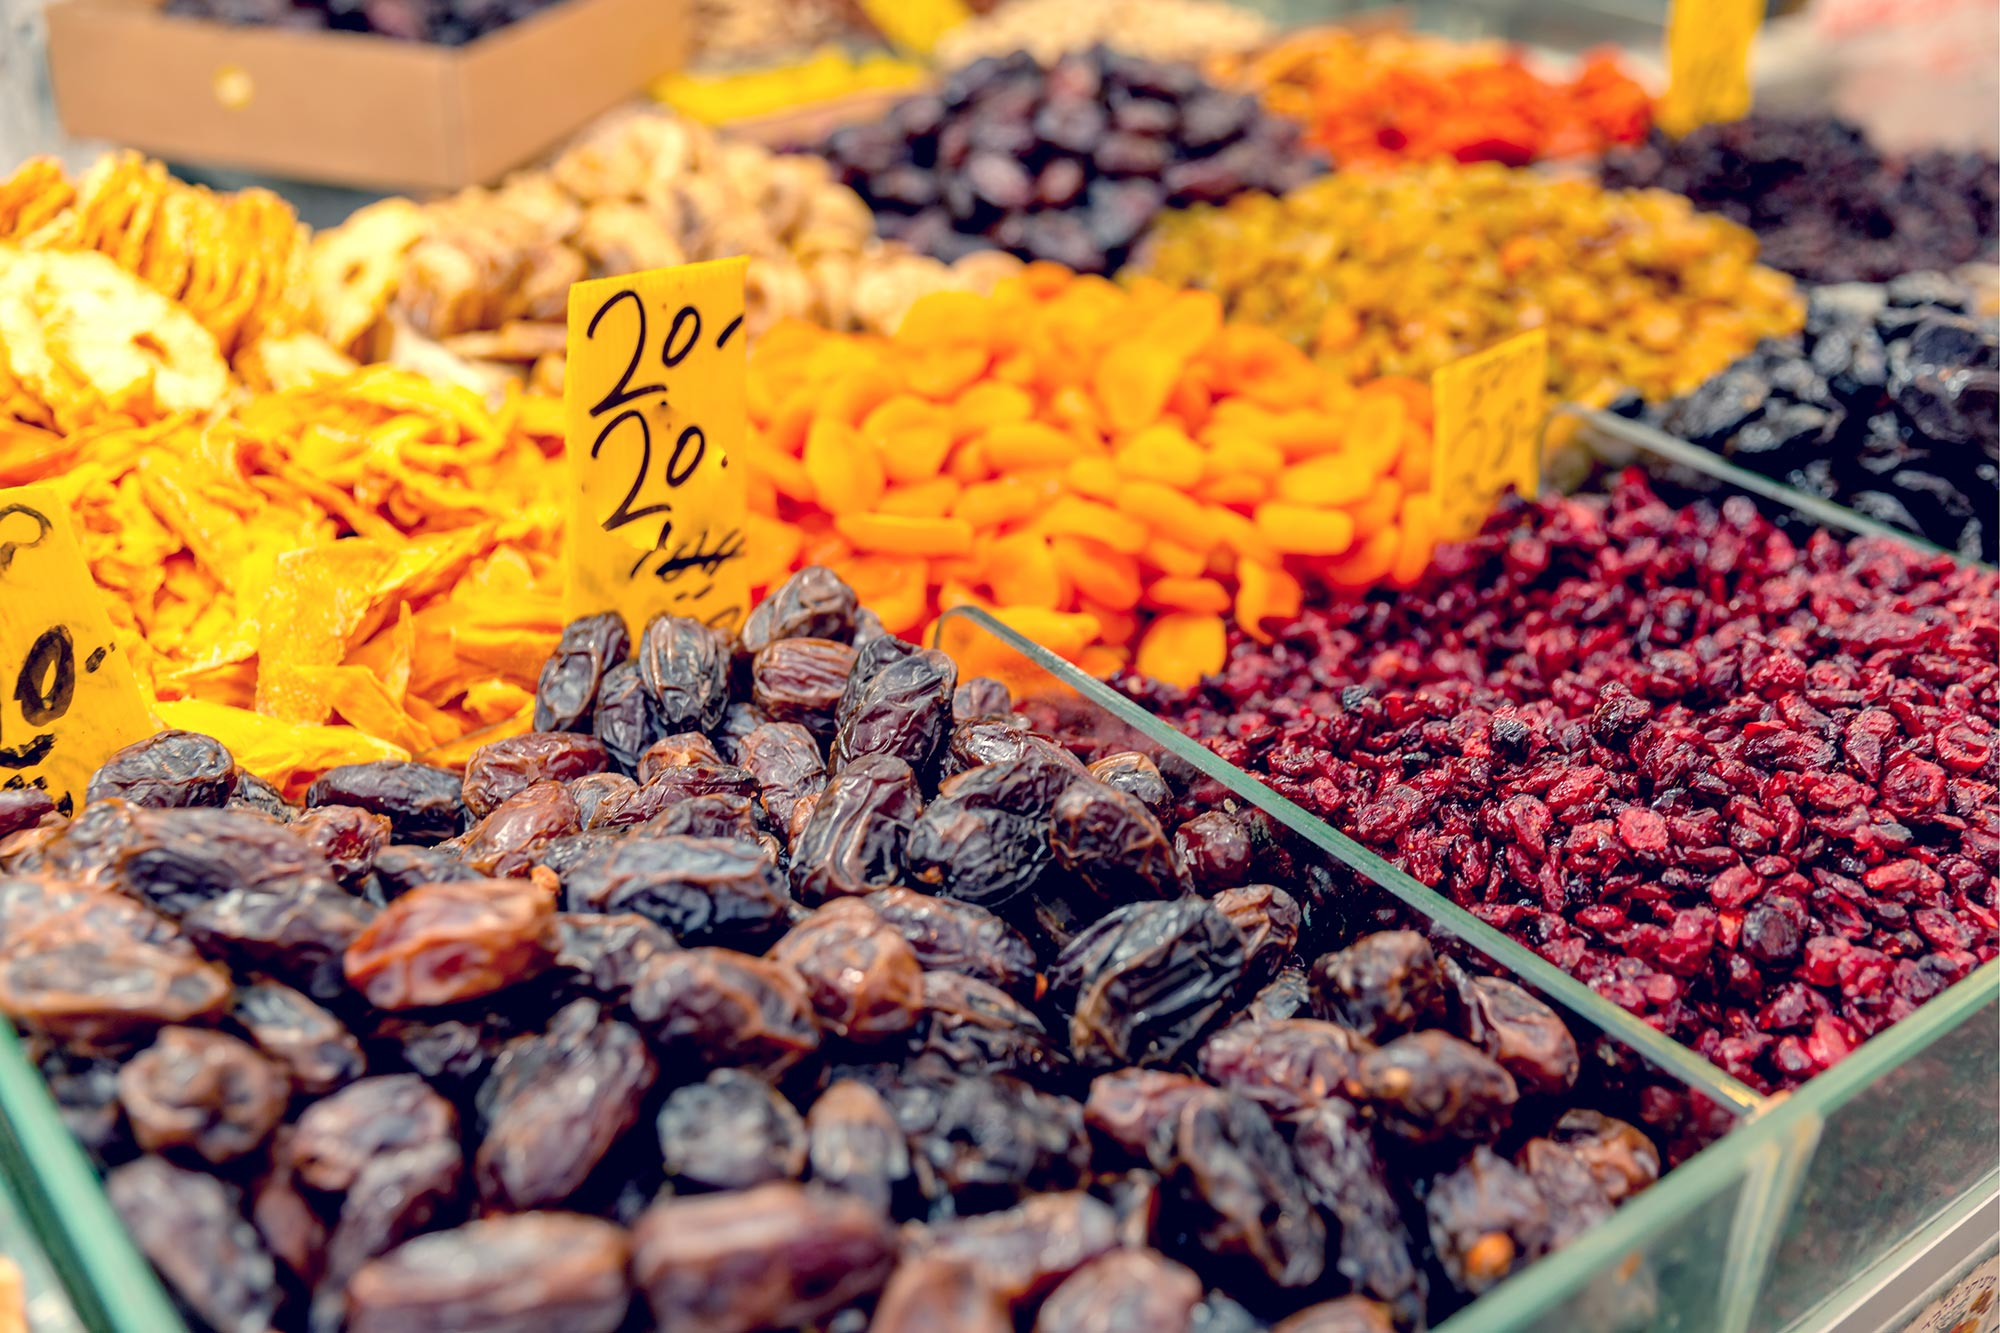 Carmel Market - Dates